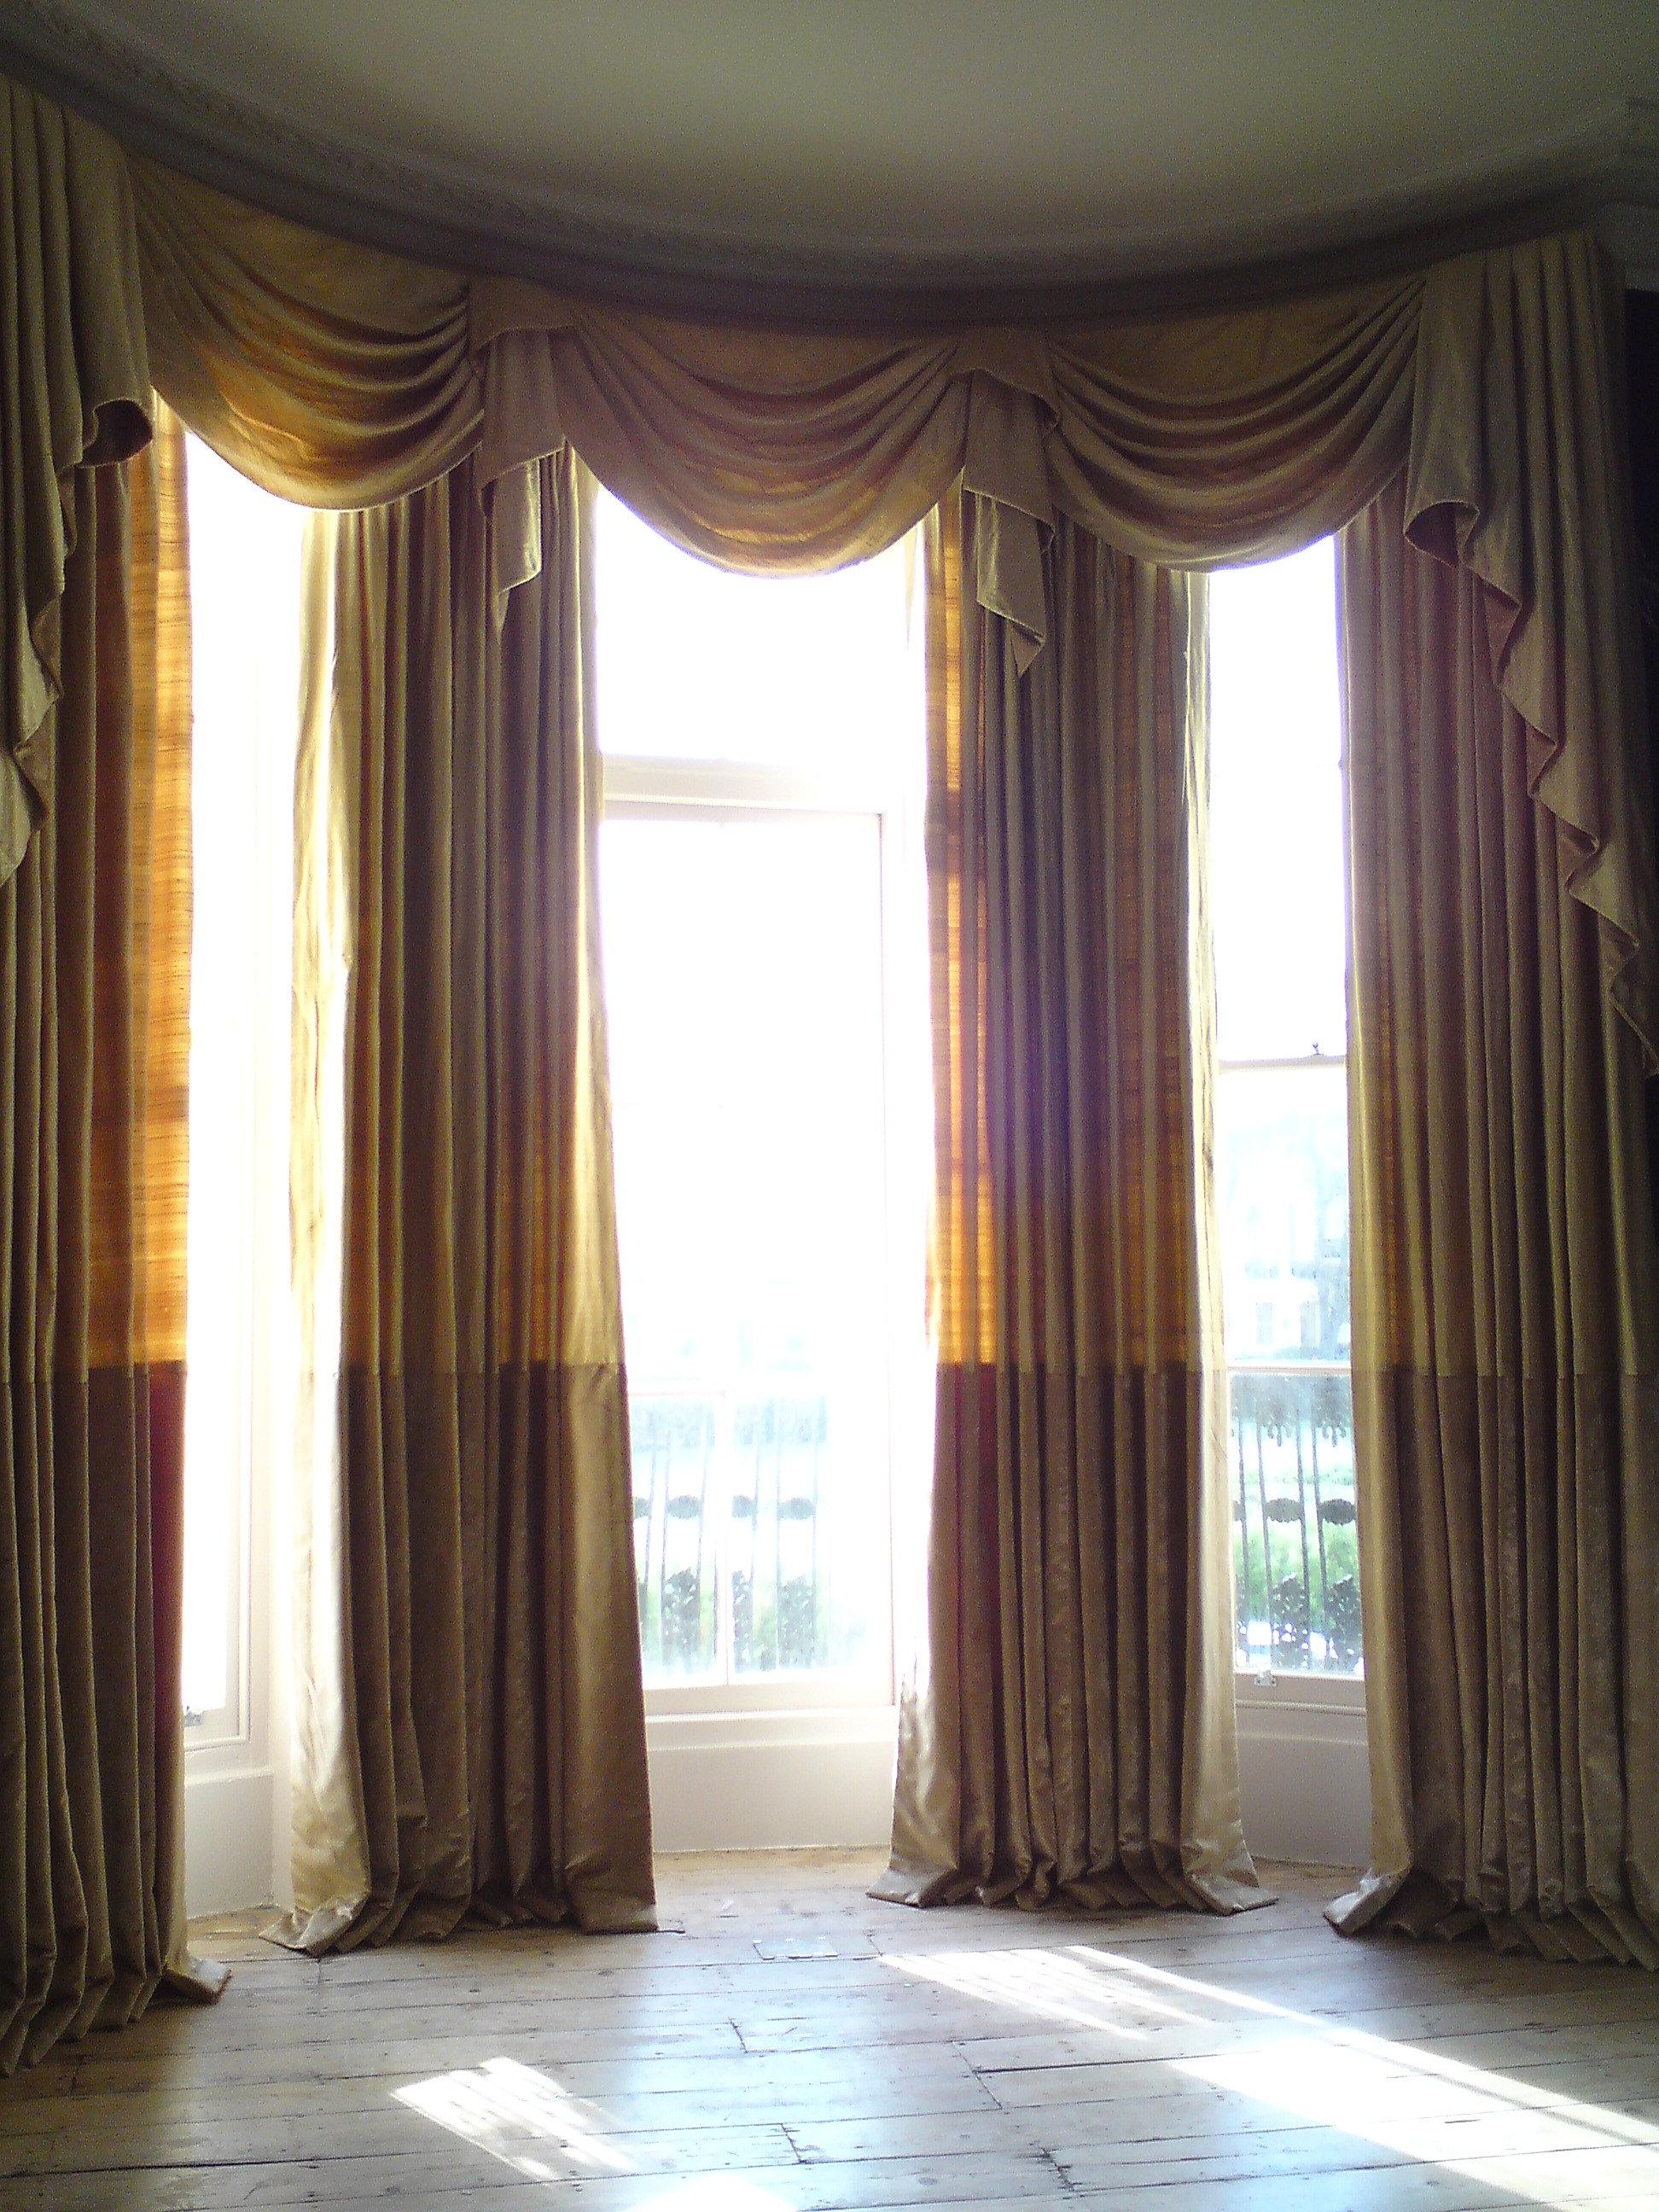 TRACKman very tall bay windows